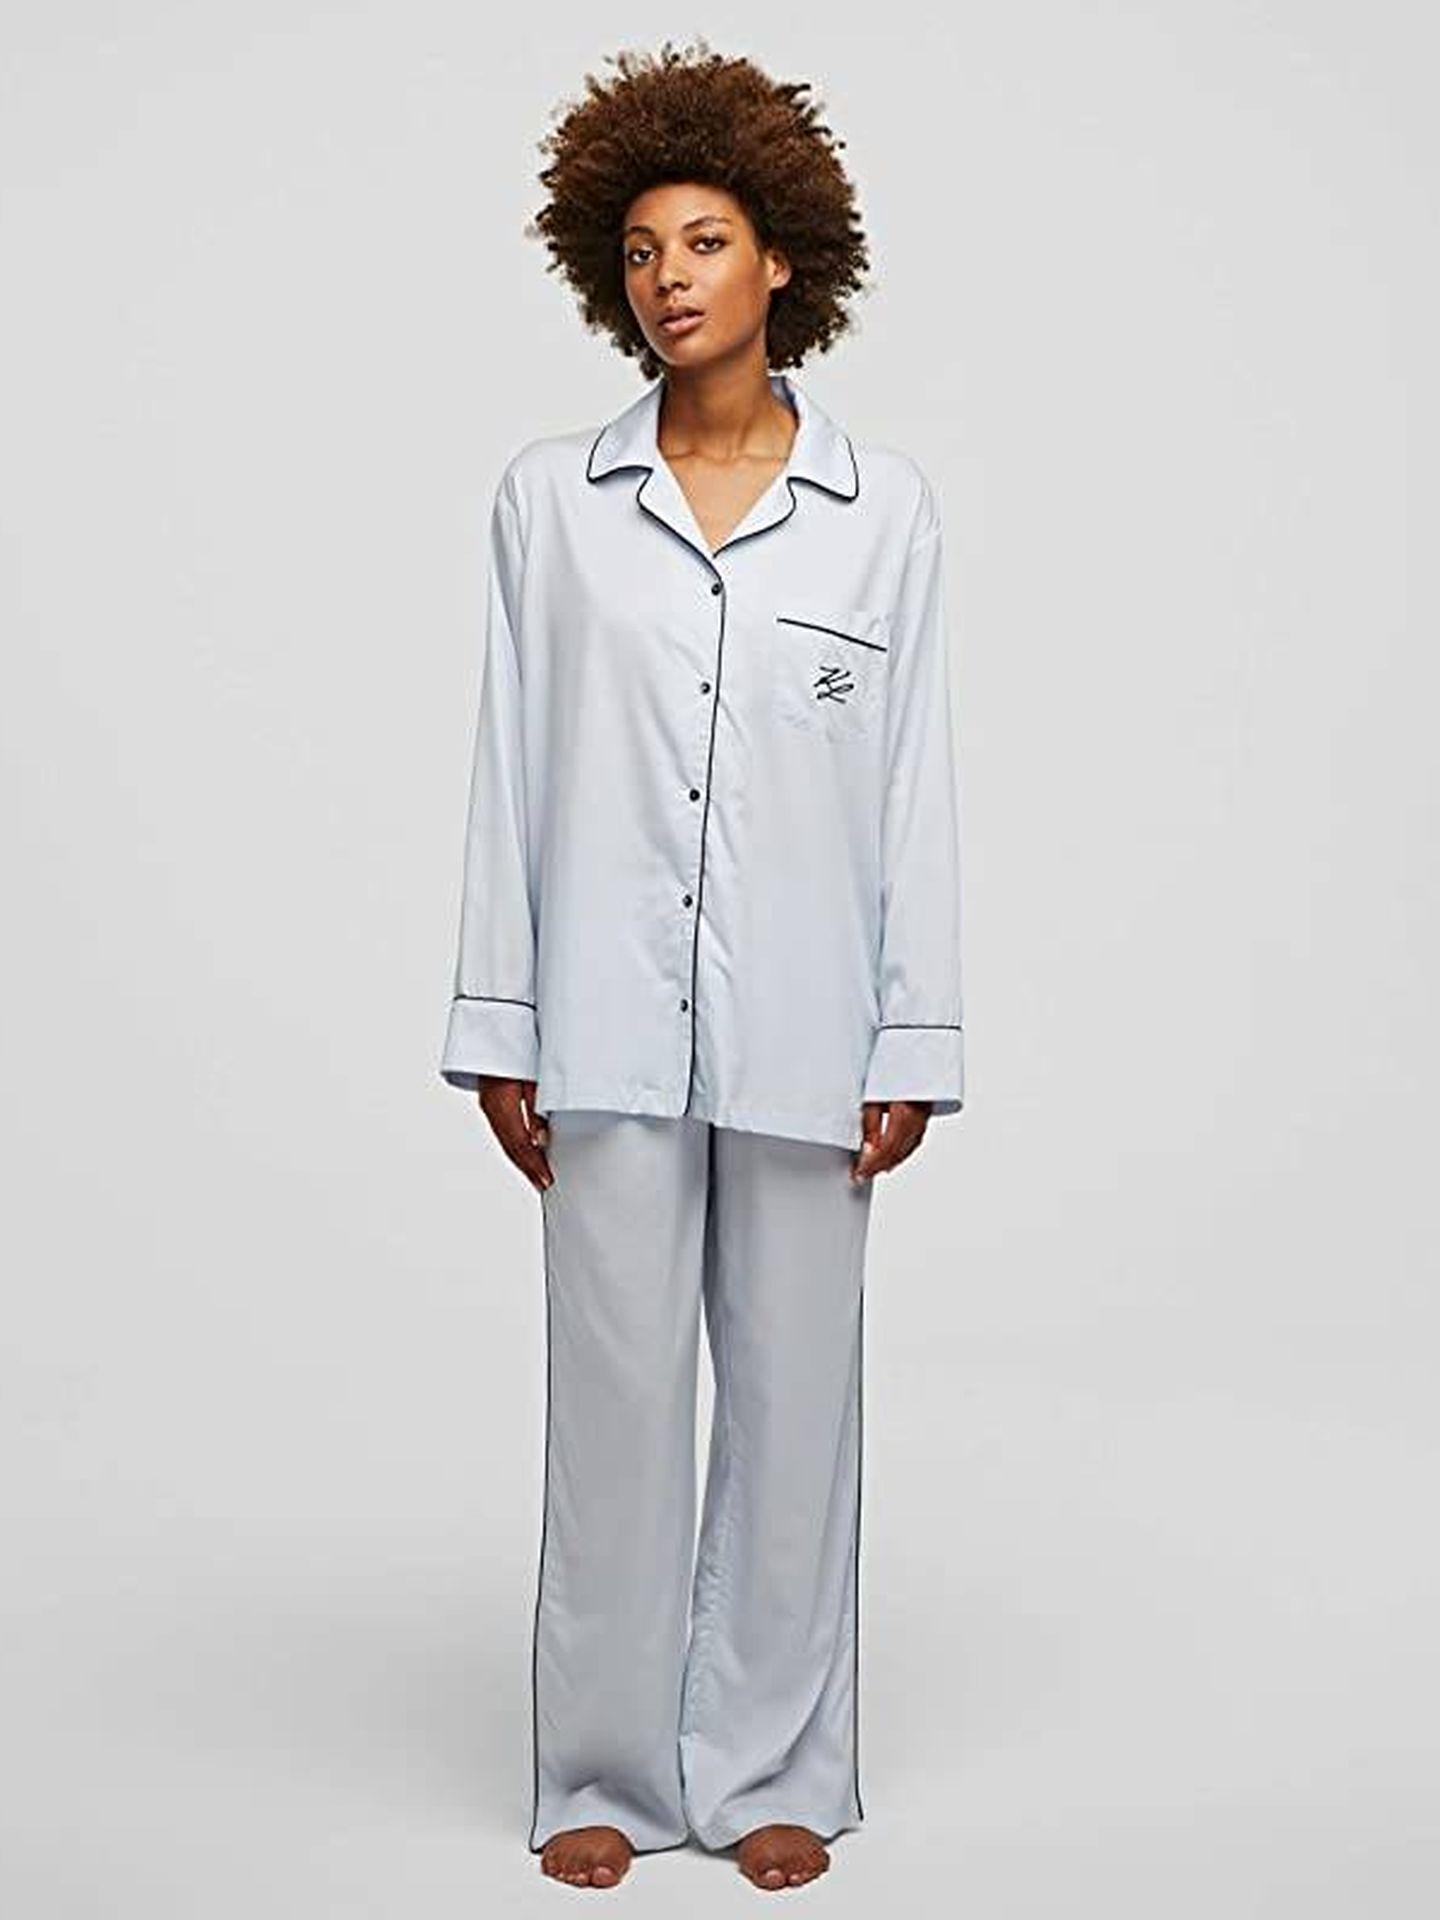 Pijama de Karl Lagerfeld. (Cortesía)